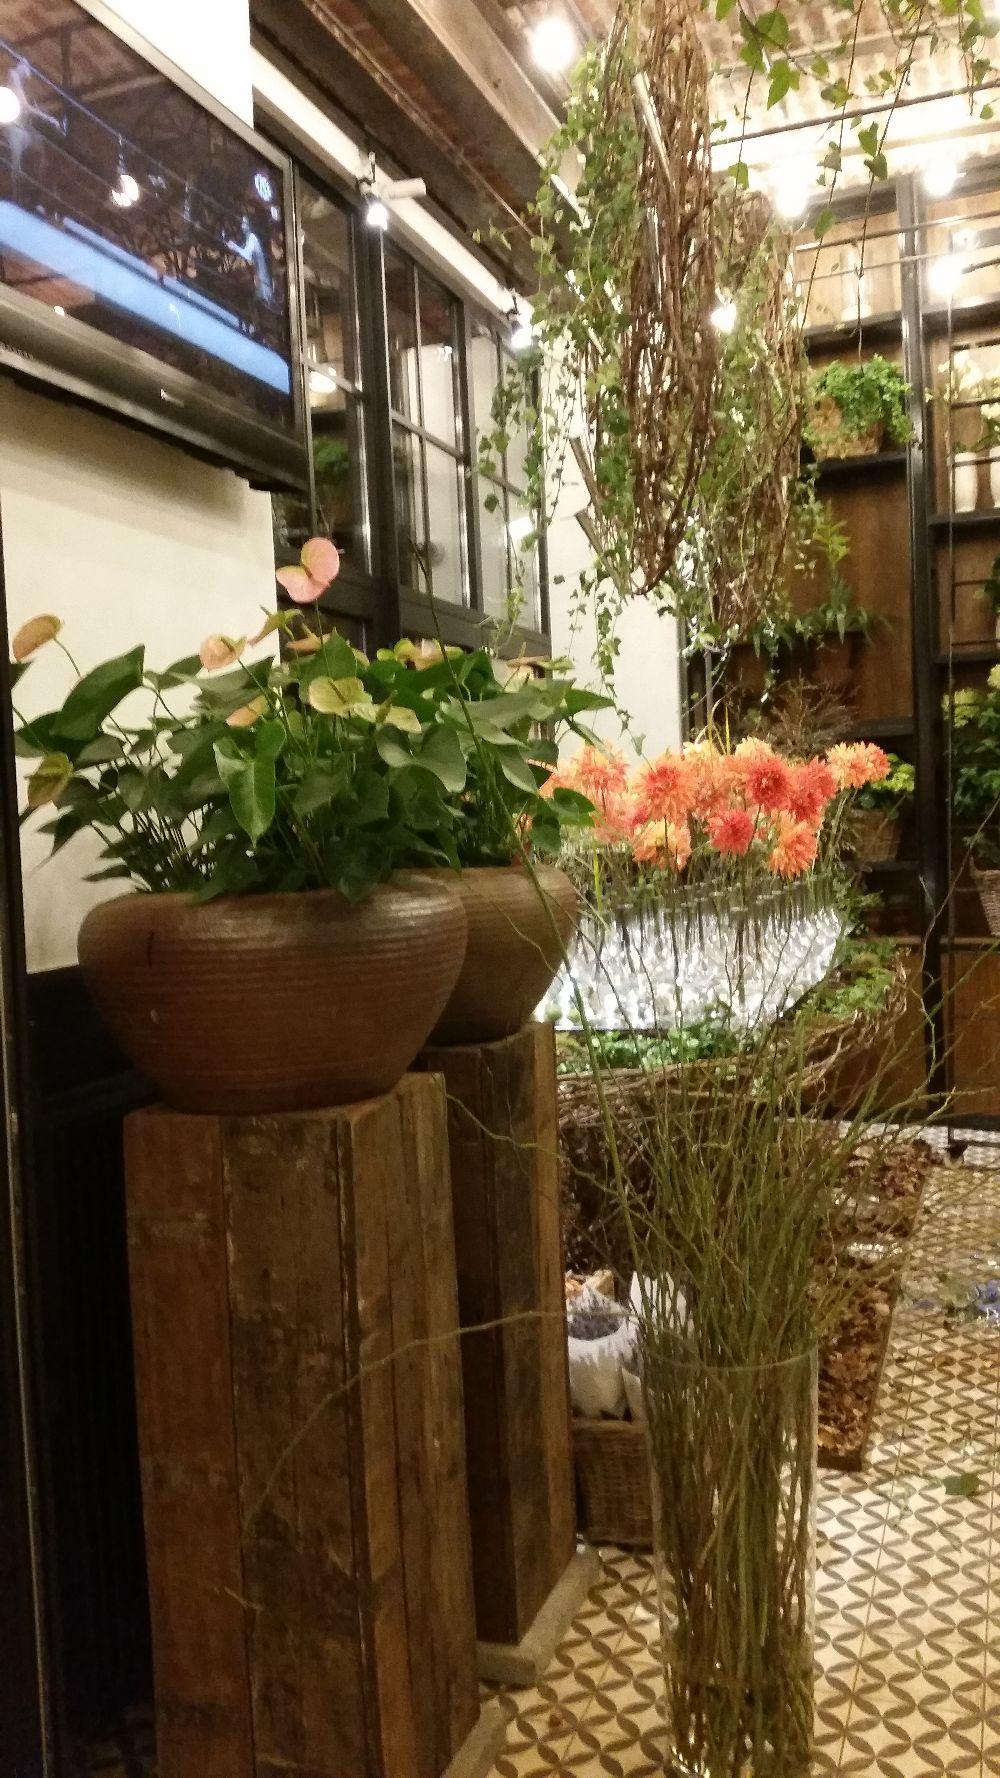 adelaparvu.com despre 45 de ani aniversare Floraria Iris, design floral Nicu Bocancea (48)